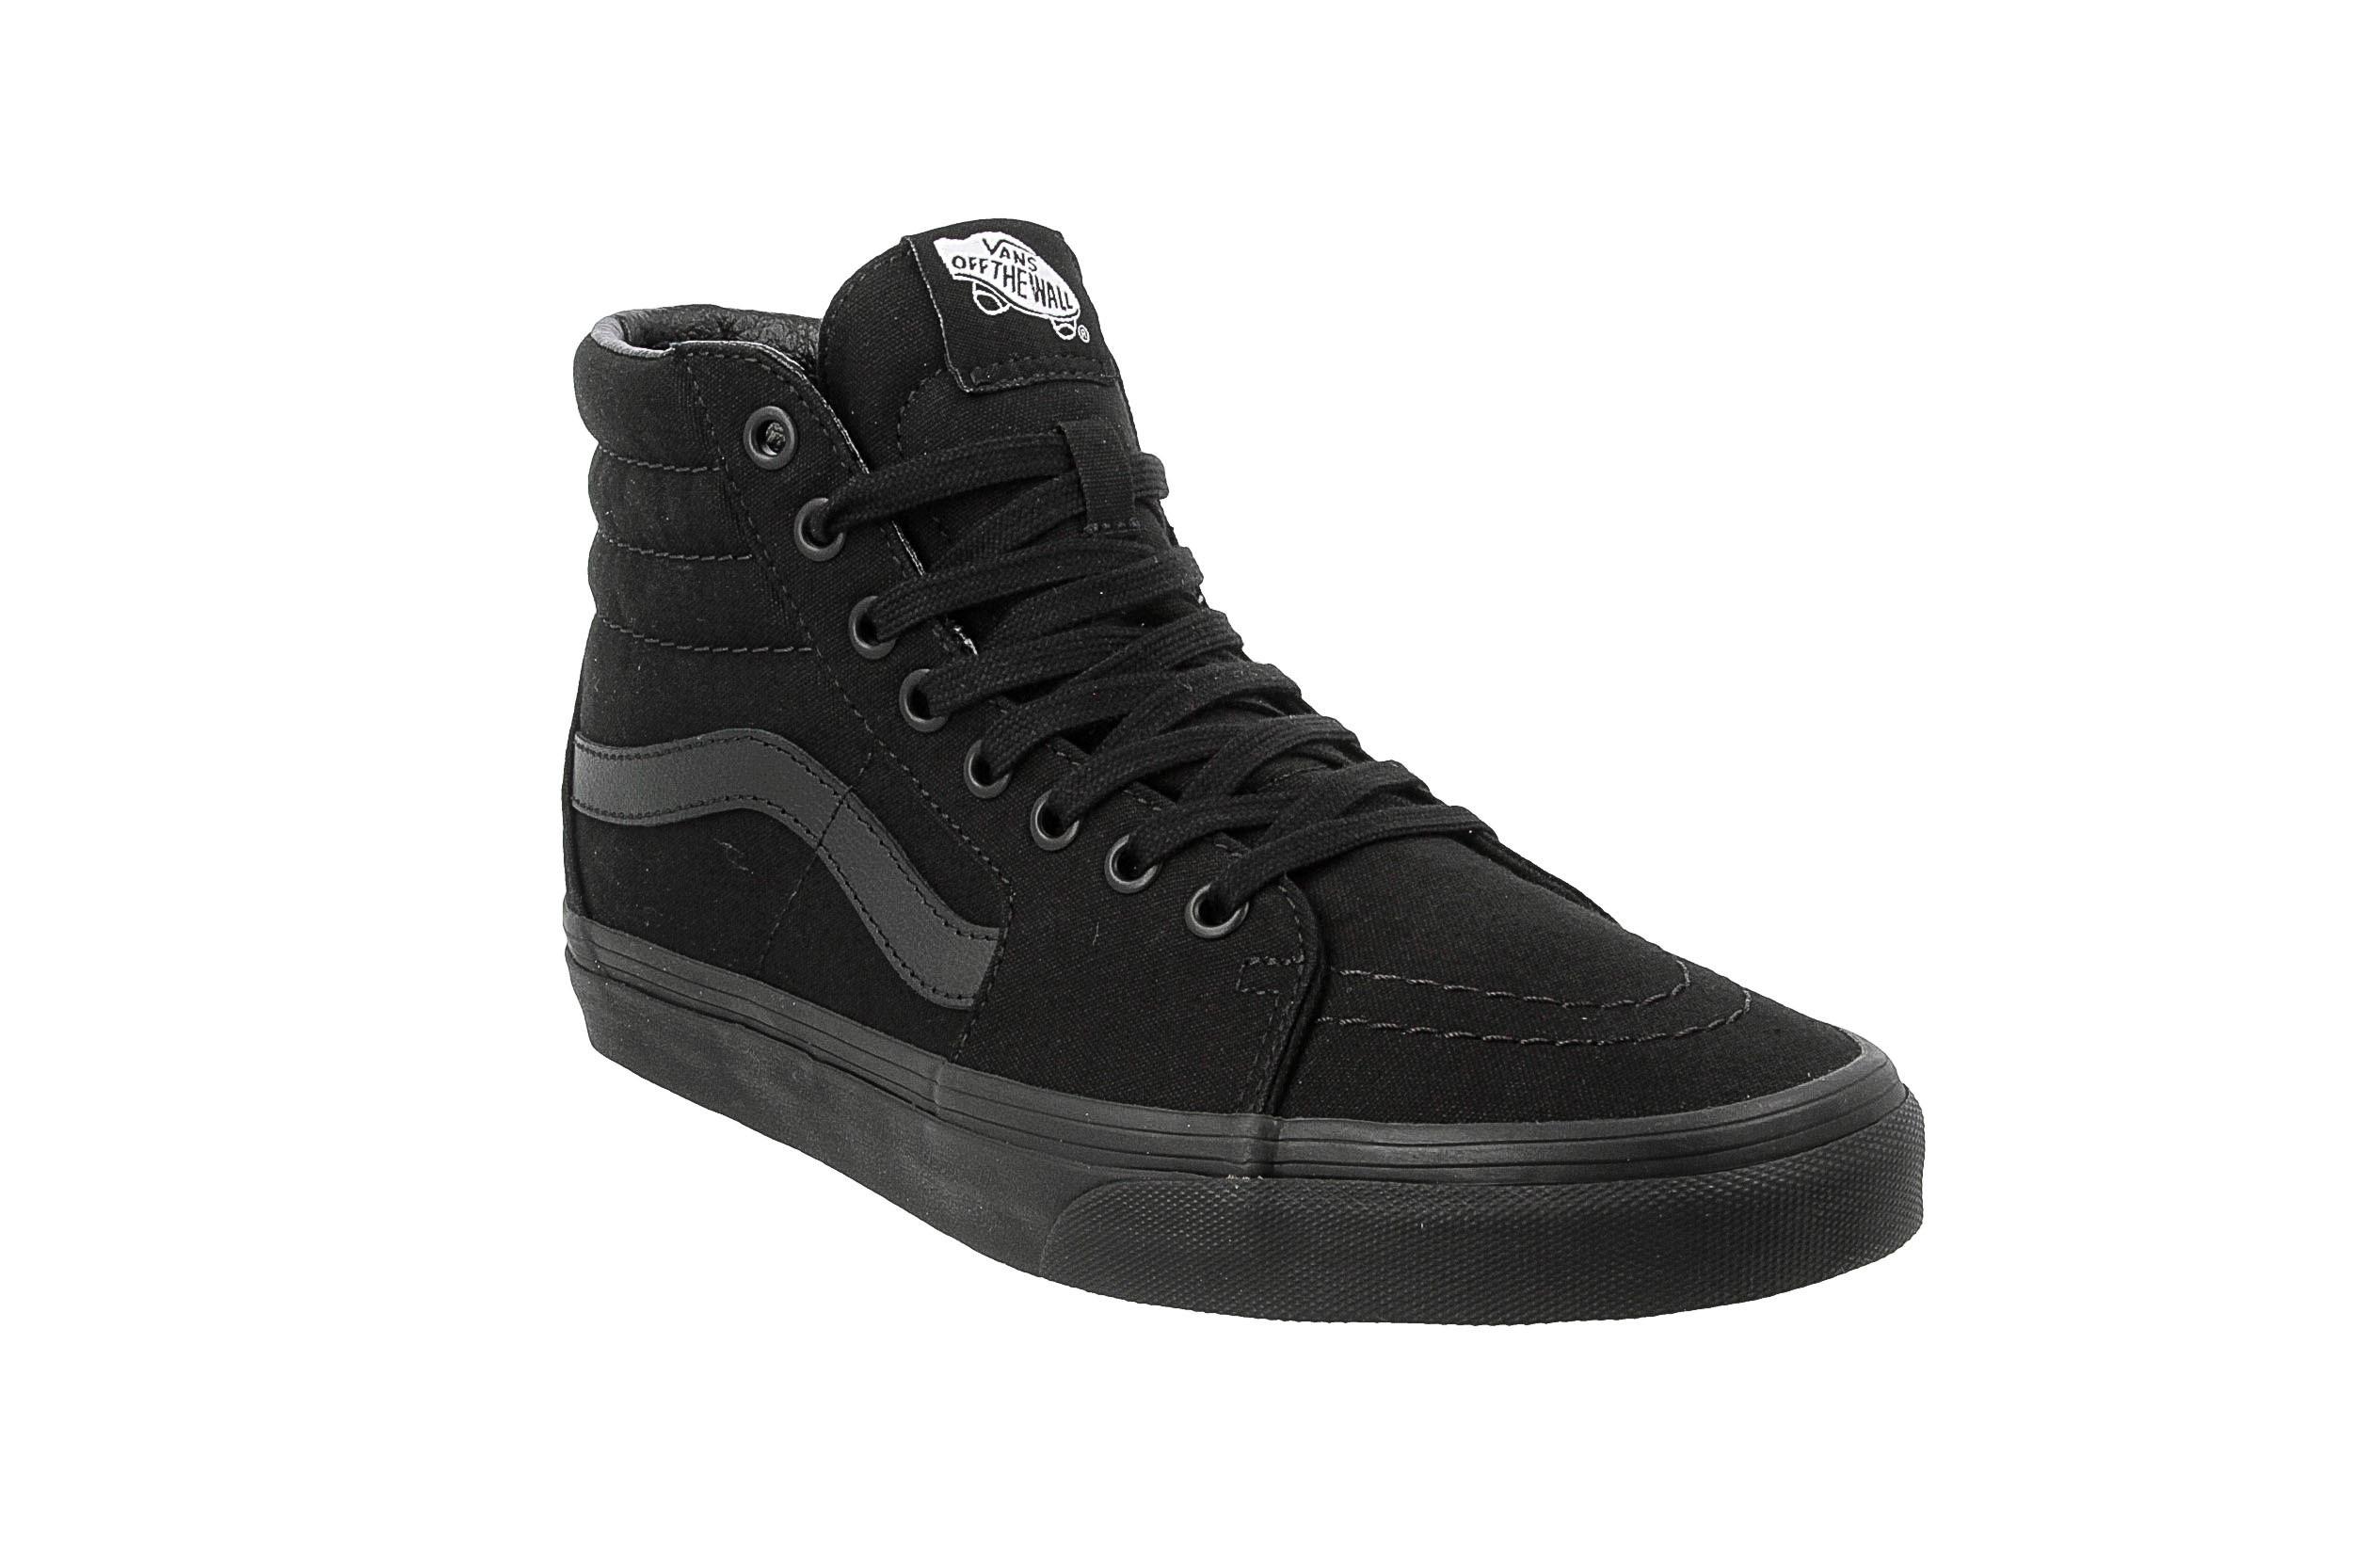 Vans Sneakers Sk8 Hi VN000D5IBKA BlackBlack